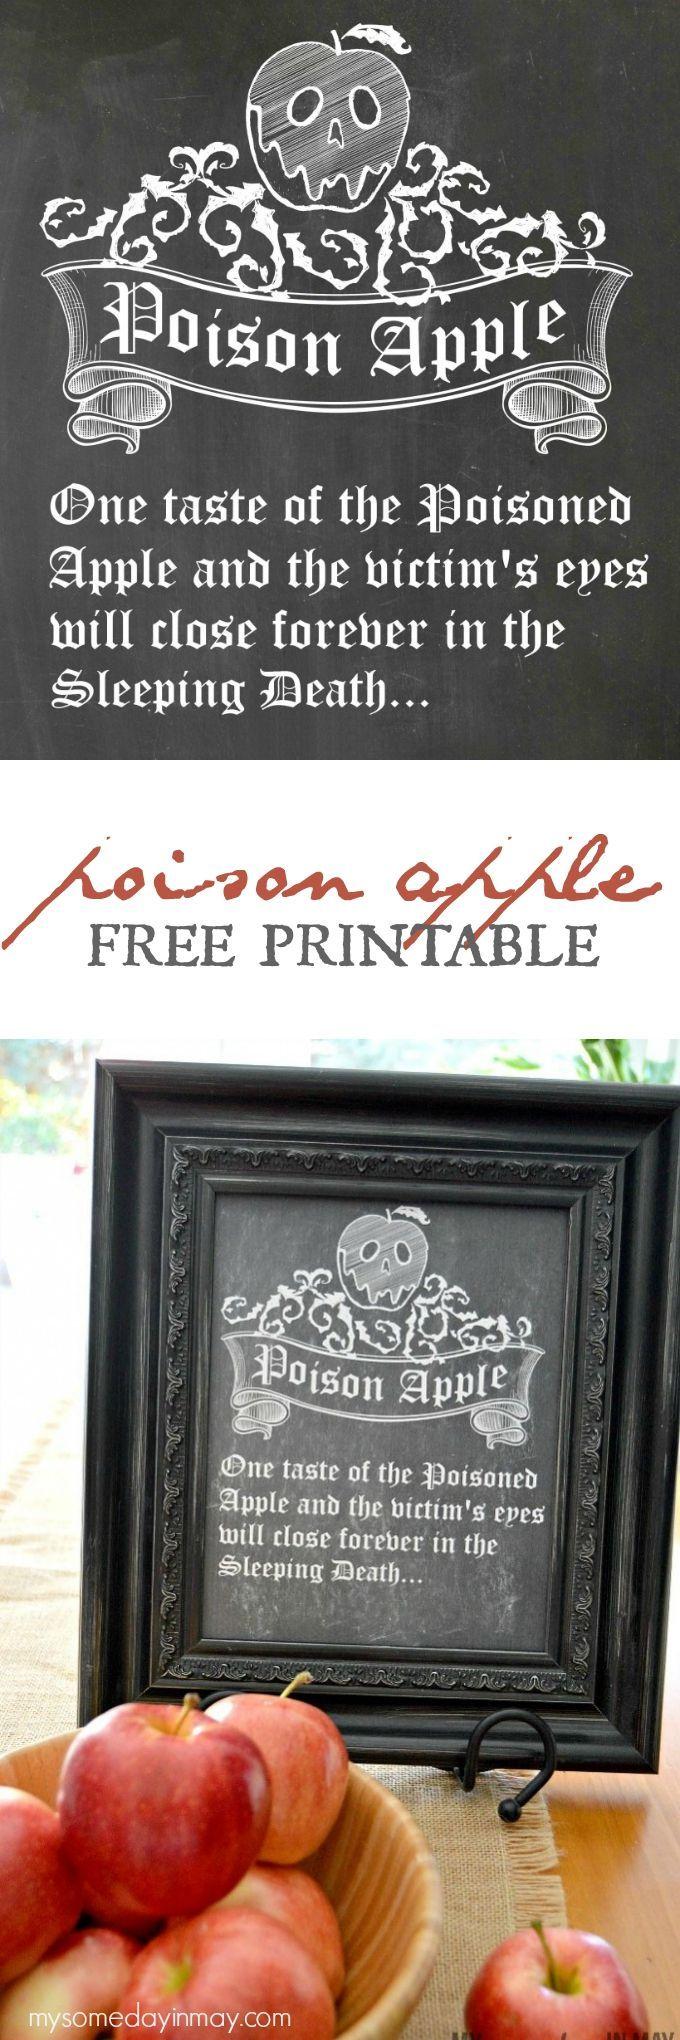 Adorable & Spooky Poison Apple Free Printable